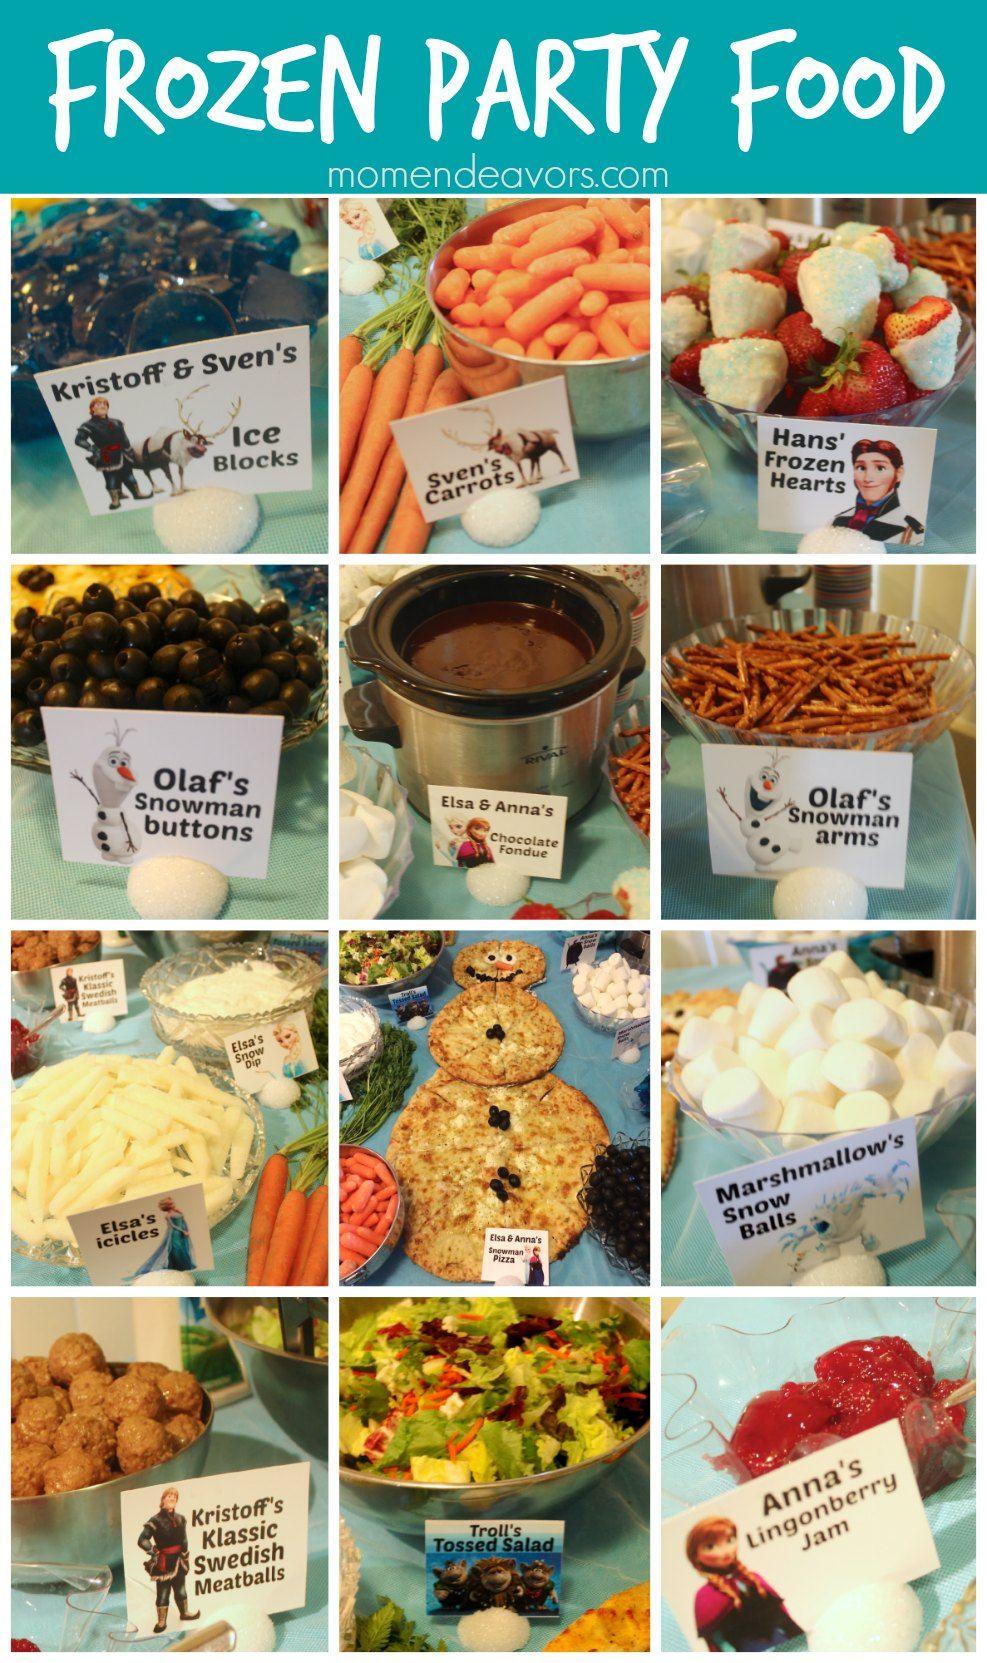 Disney Frozen Party Food Menu - Mom Endeavors